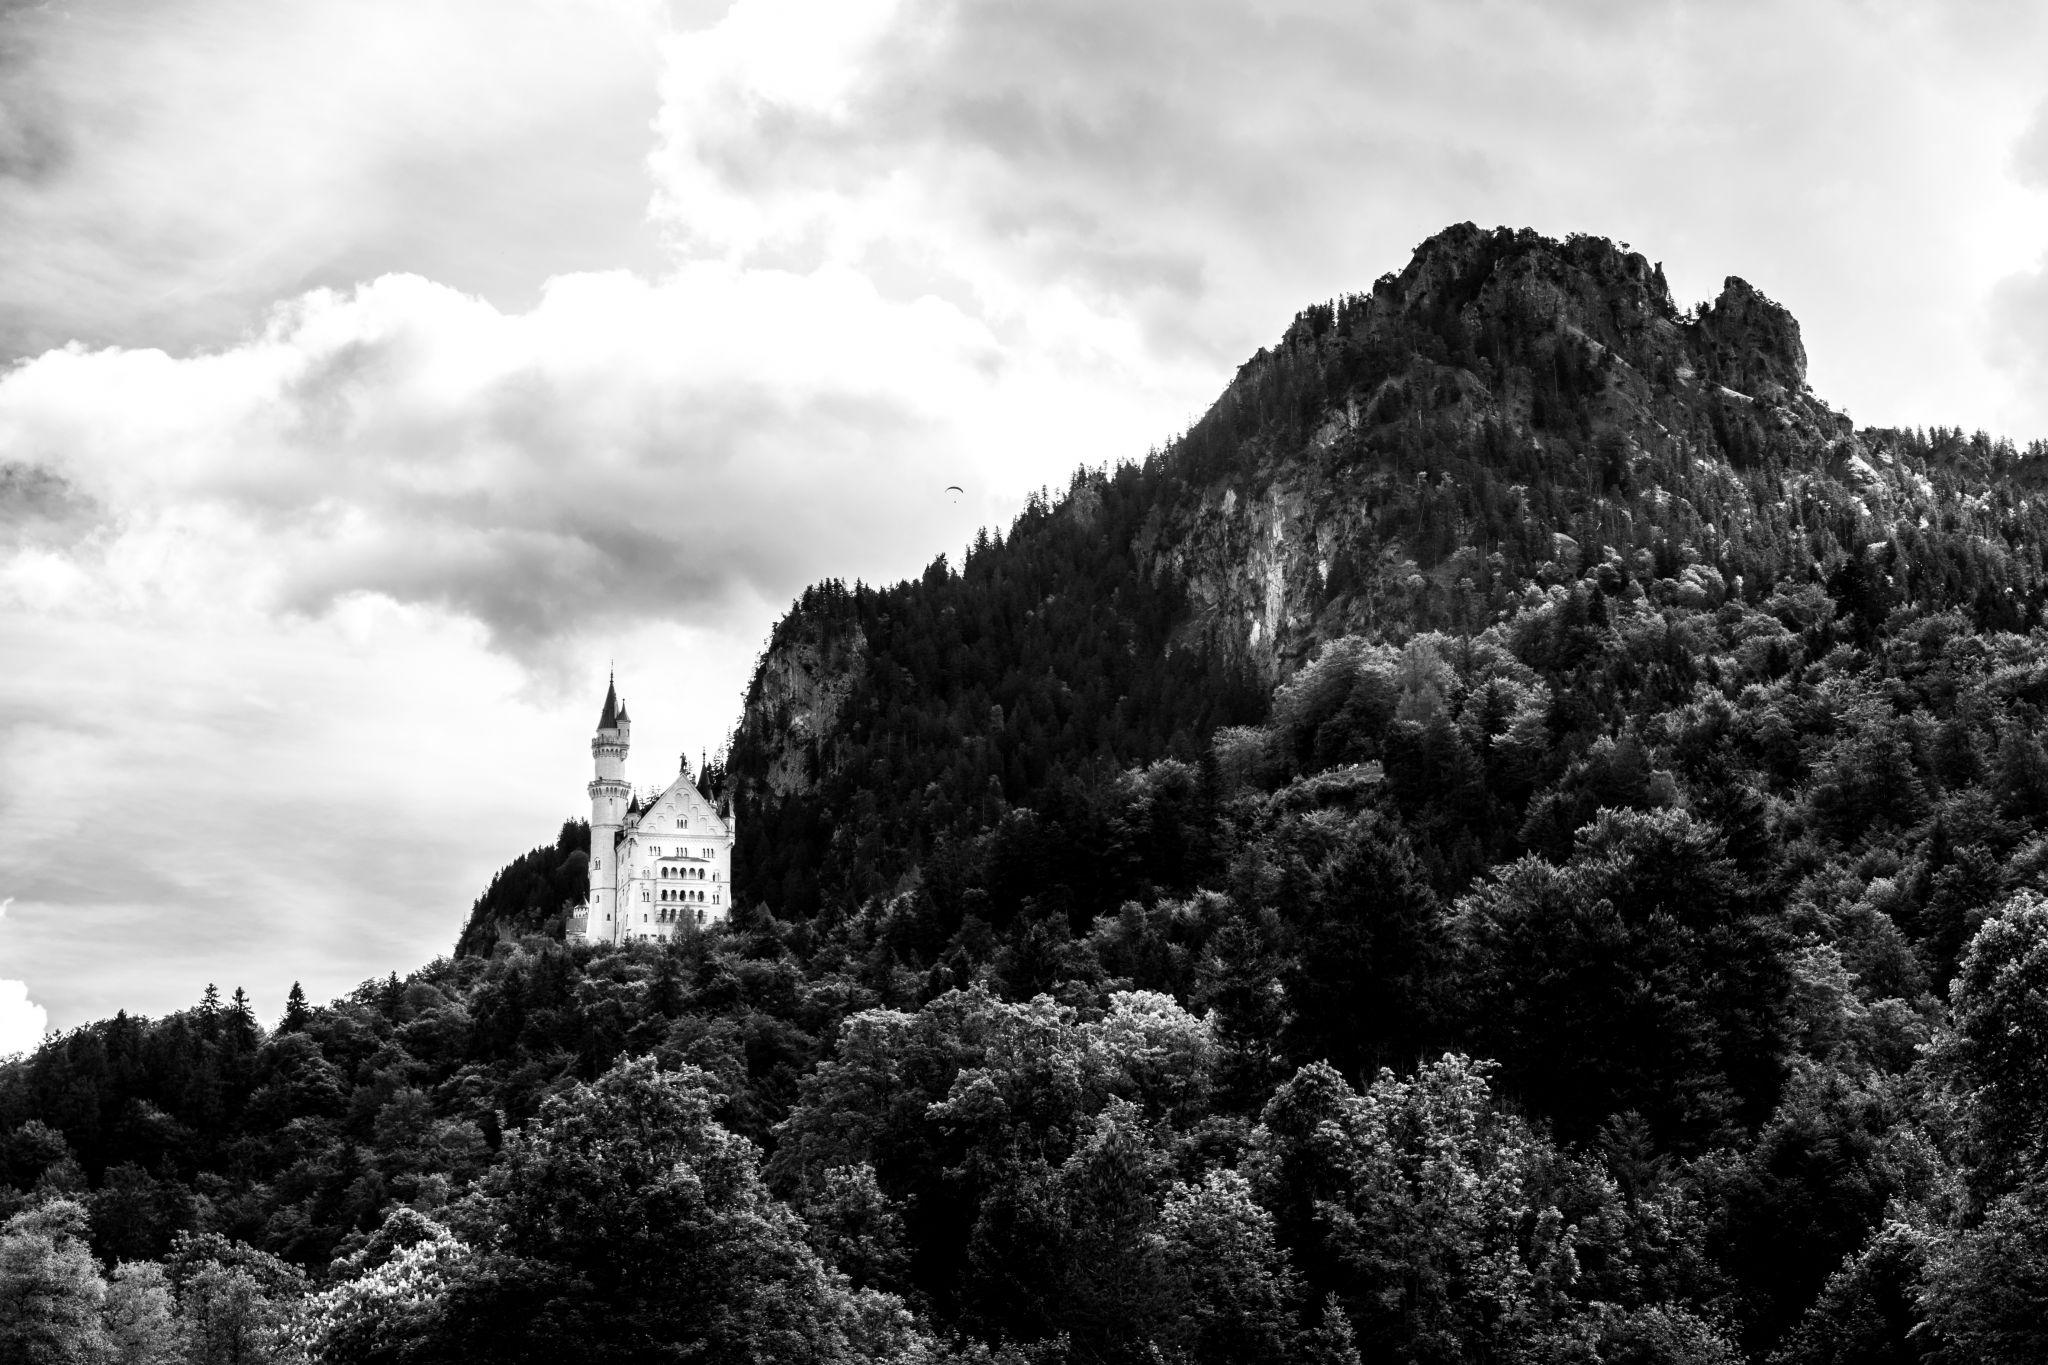 Lower view of Castle Neuschwanstein, Germany